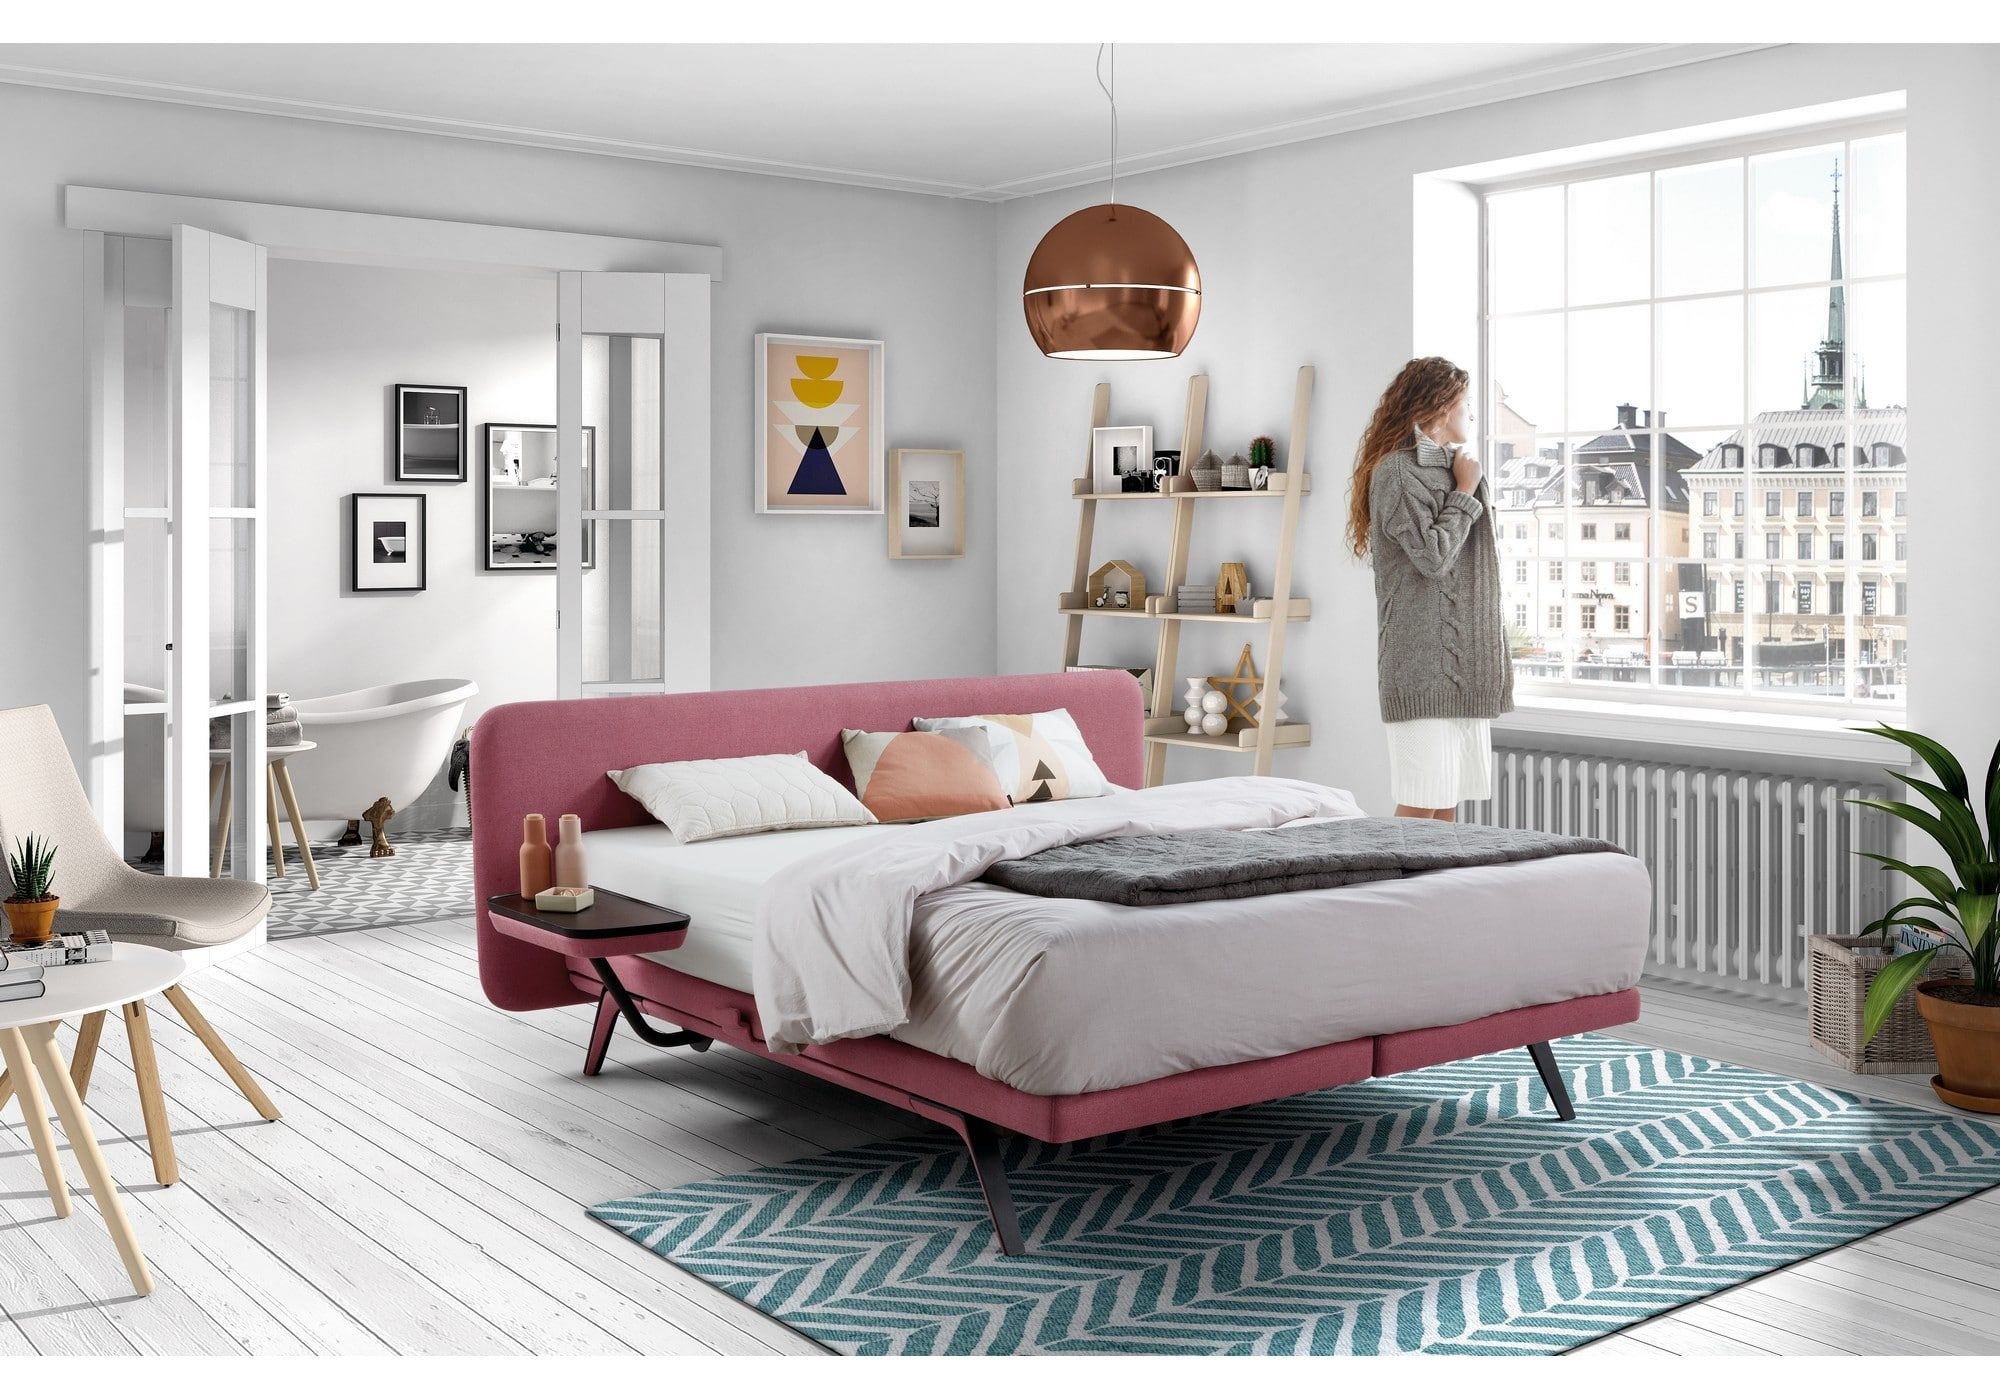 Velda Polster Boxspringbett Modell Finesse Massiv Bett